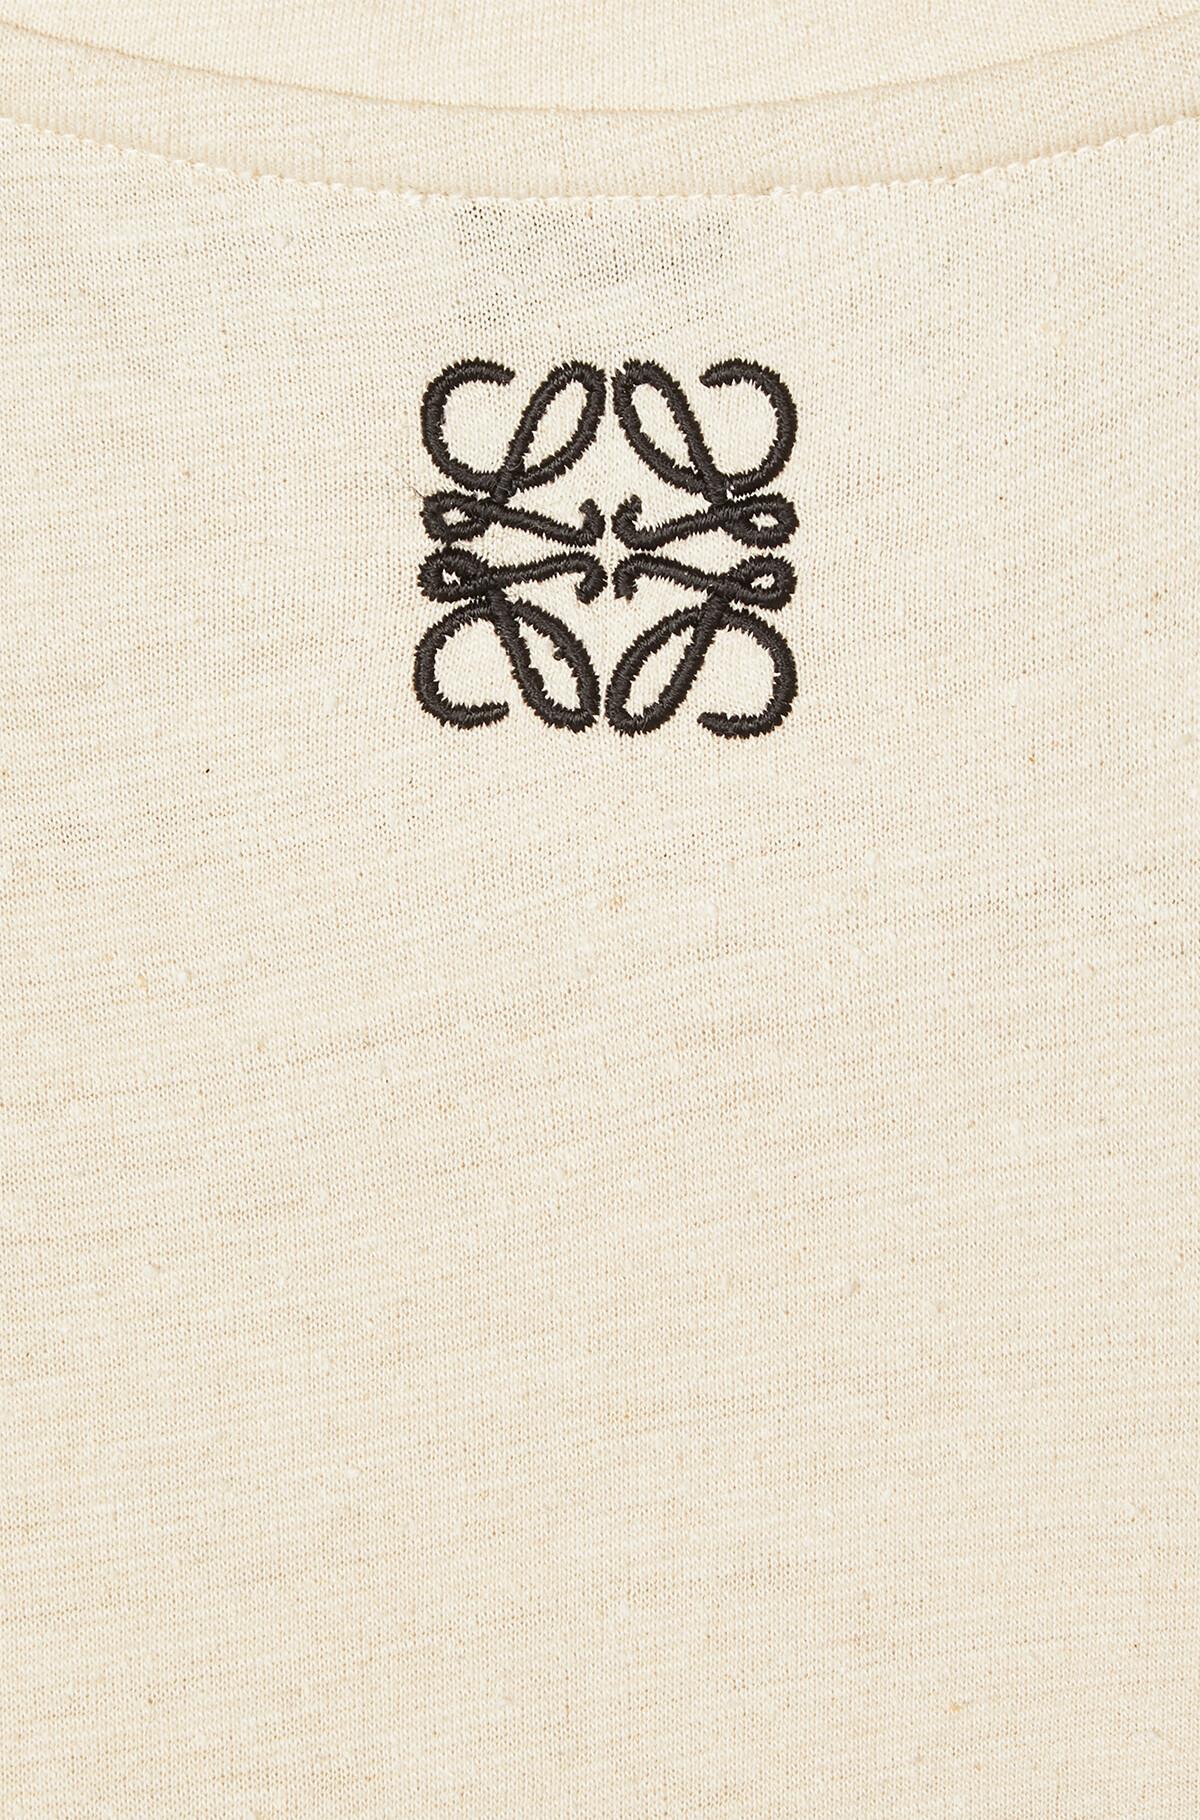 LOEWE Satin & Jersey T-Shirt Dress White/Off-White front